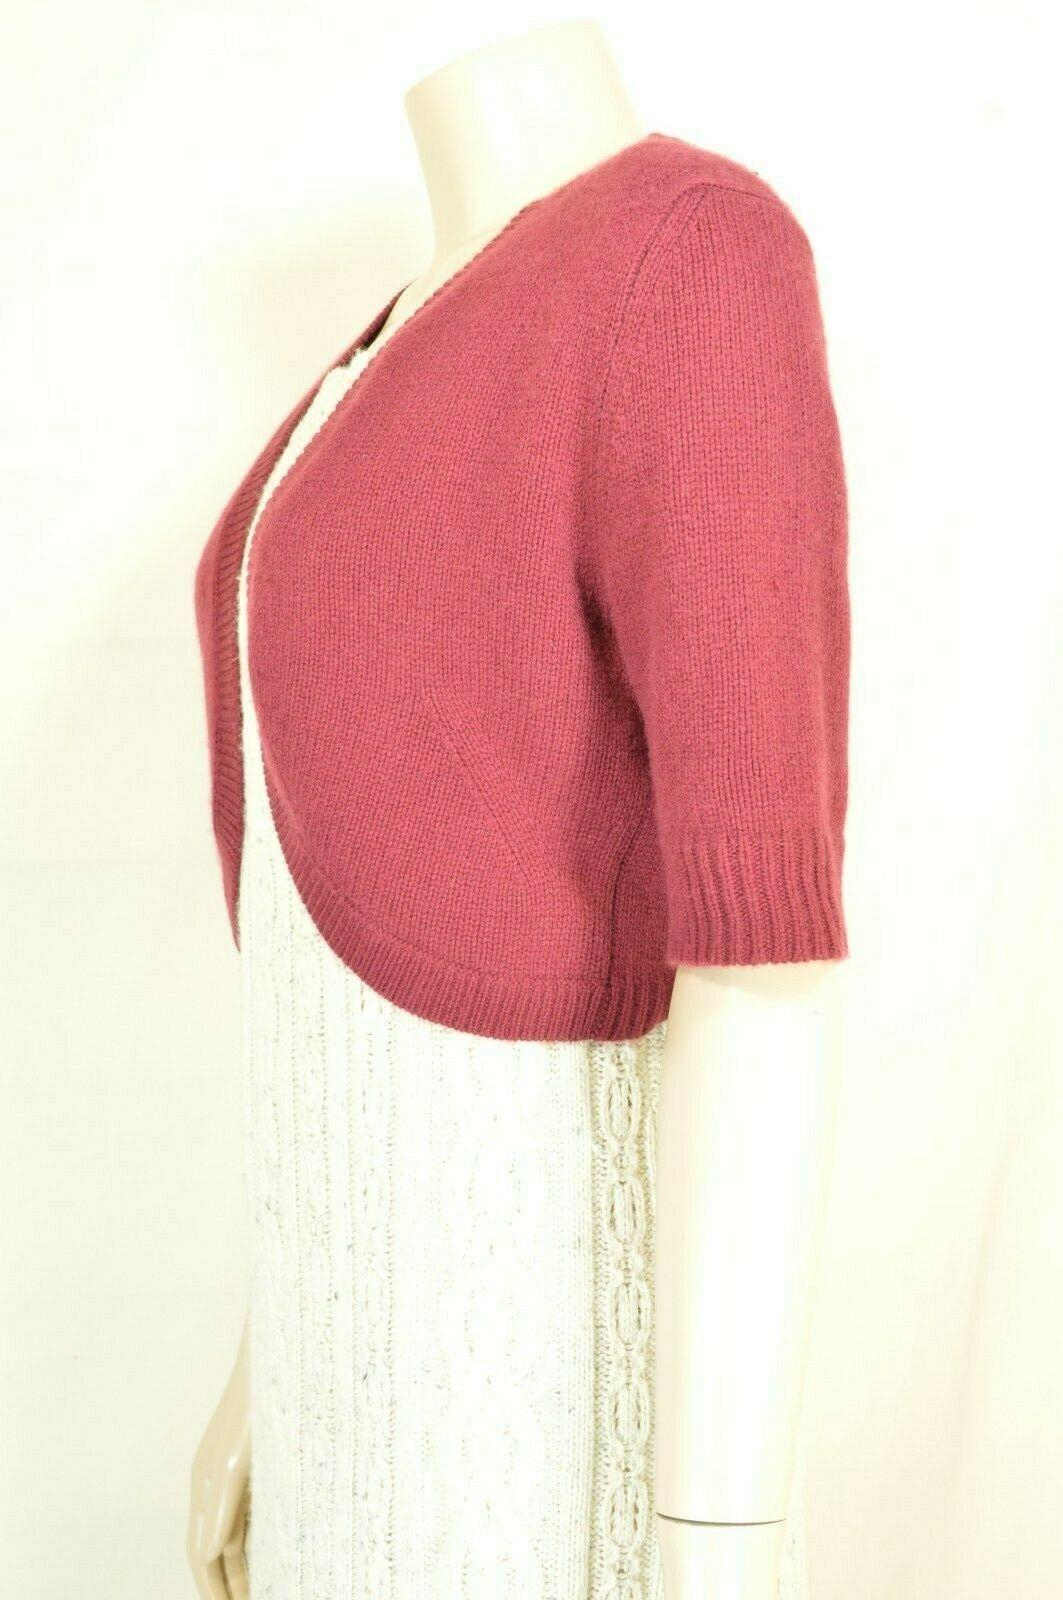 Neiman Marcus sweater M NWT red 100% cashmere shrug bolero cropped $195 new image 11